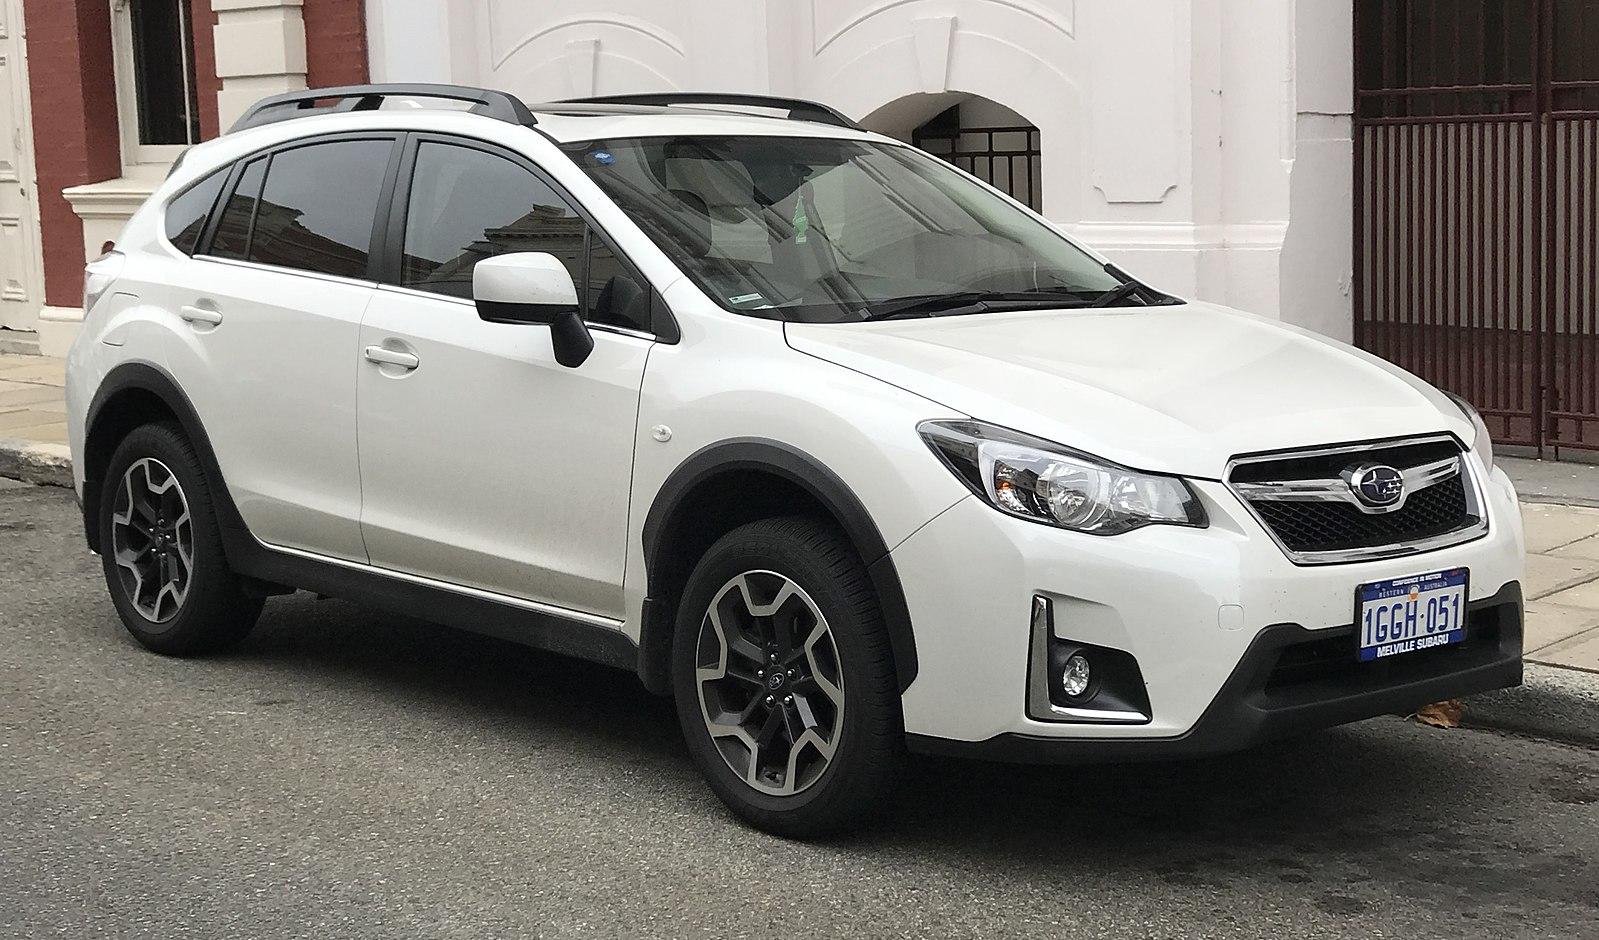 White Subaru Crosstrek